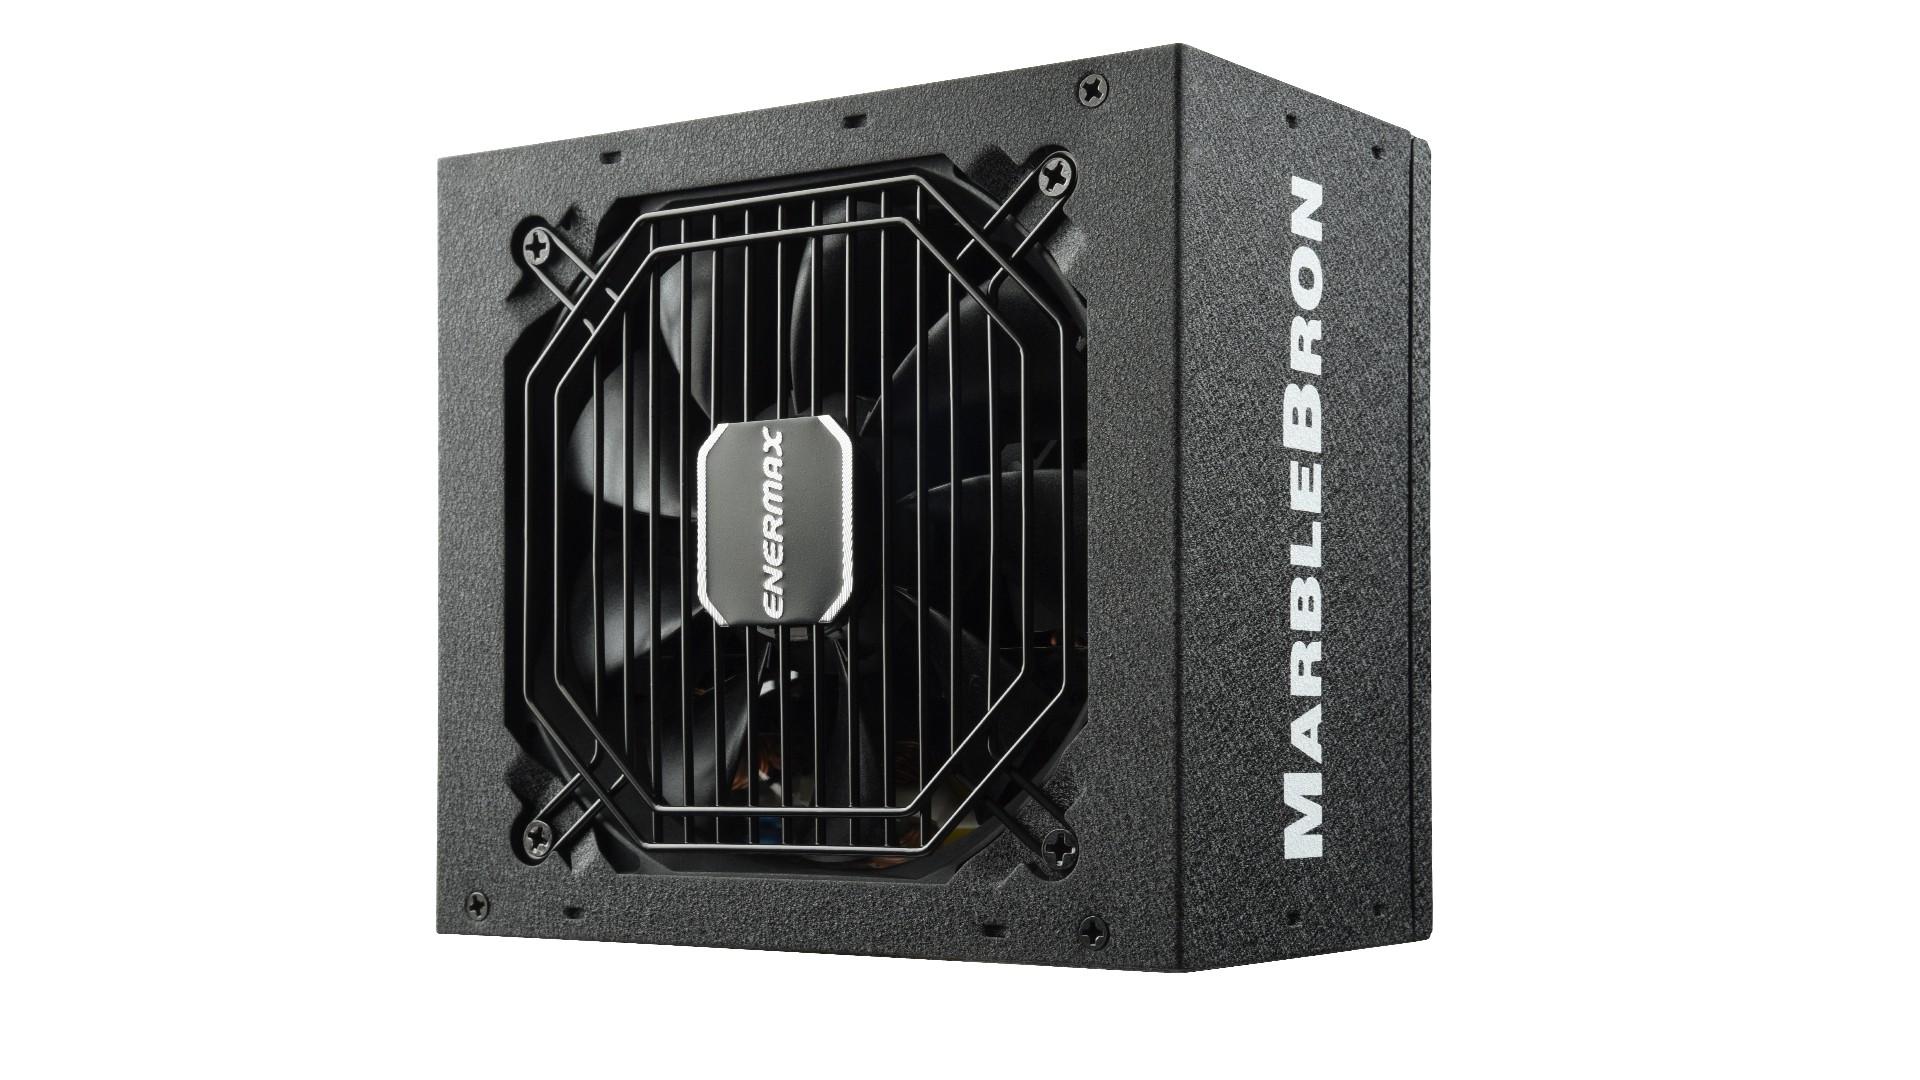 Enermax MarbleBron power supply unit 550 W 24-pin ATX ATX Zwart